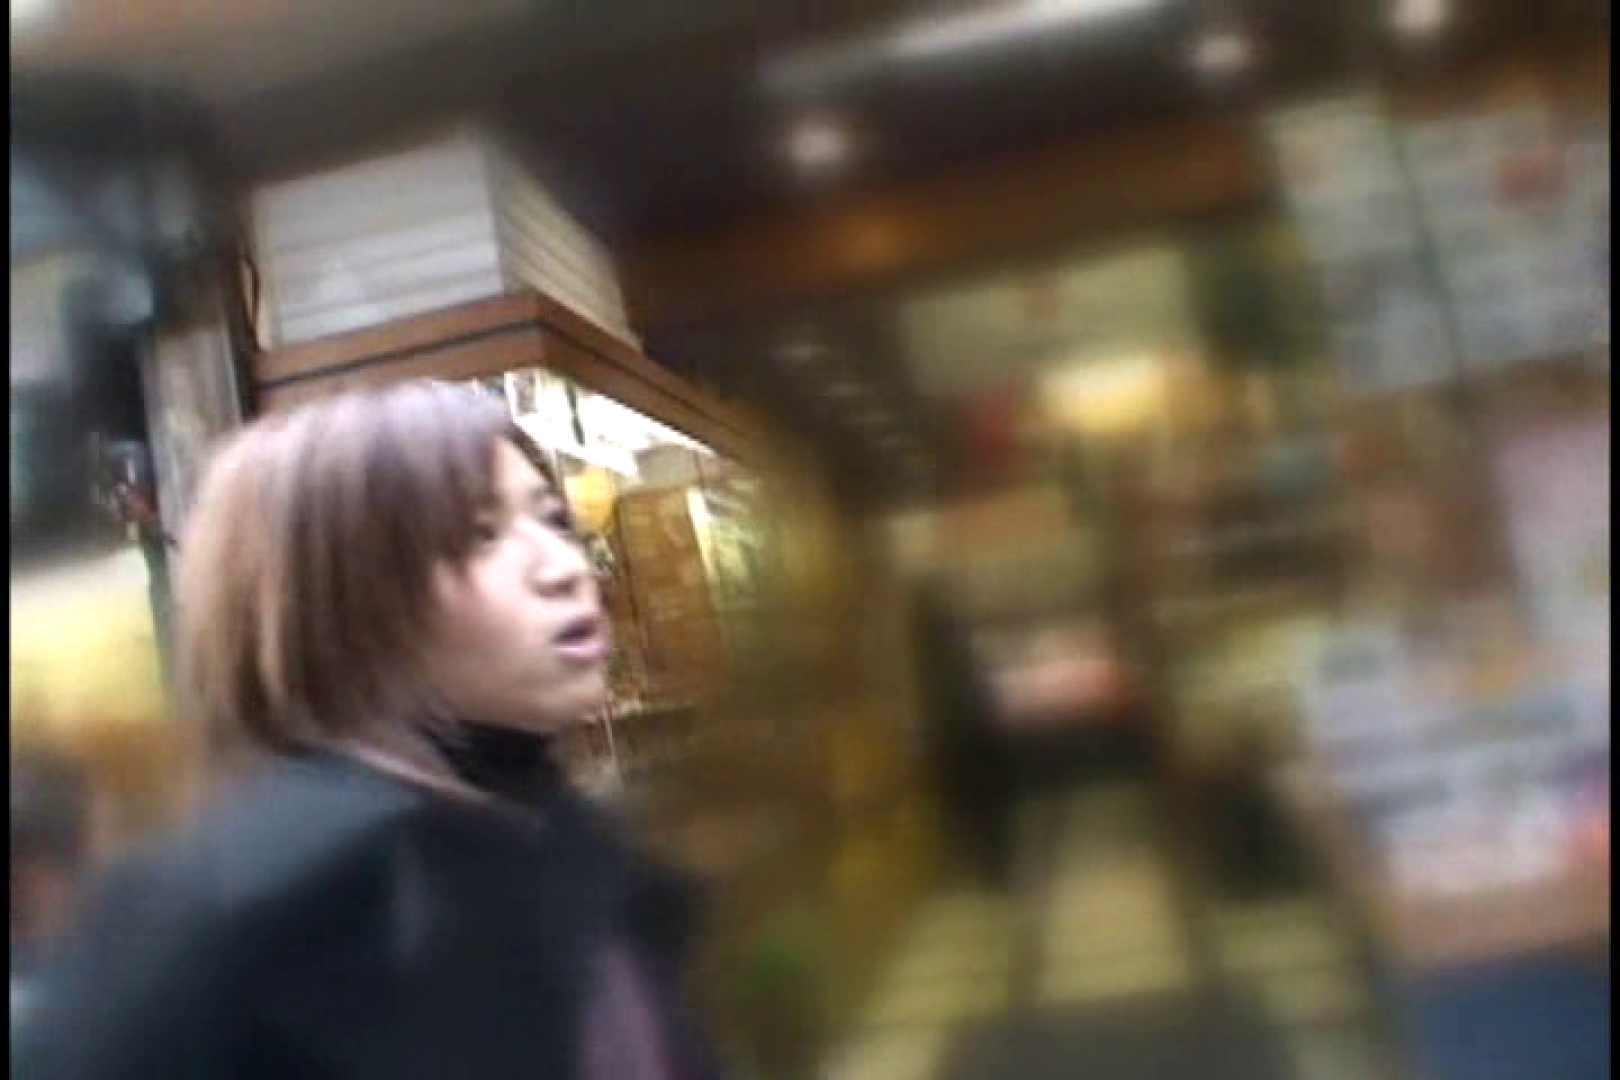 JDハンター全国ツアー vol.016 前編 女子大生のエロ動画 | 0  77PIX 27